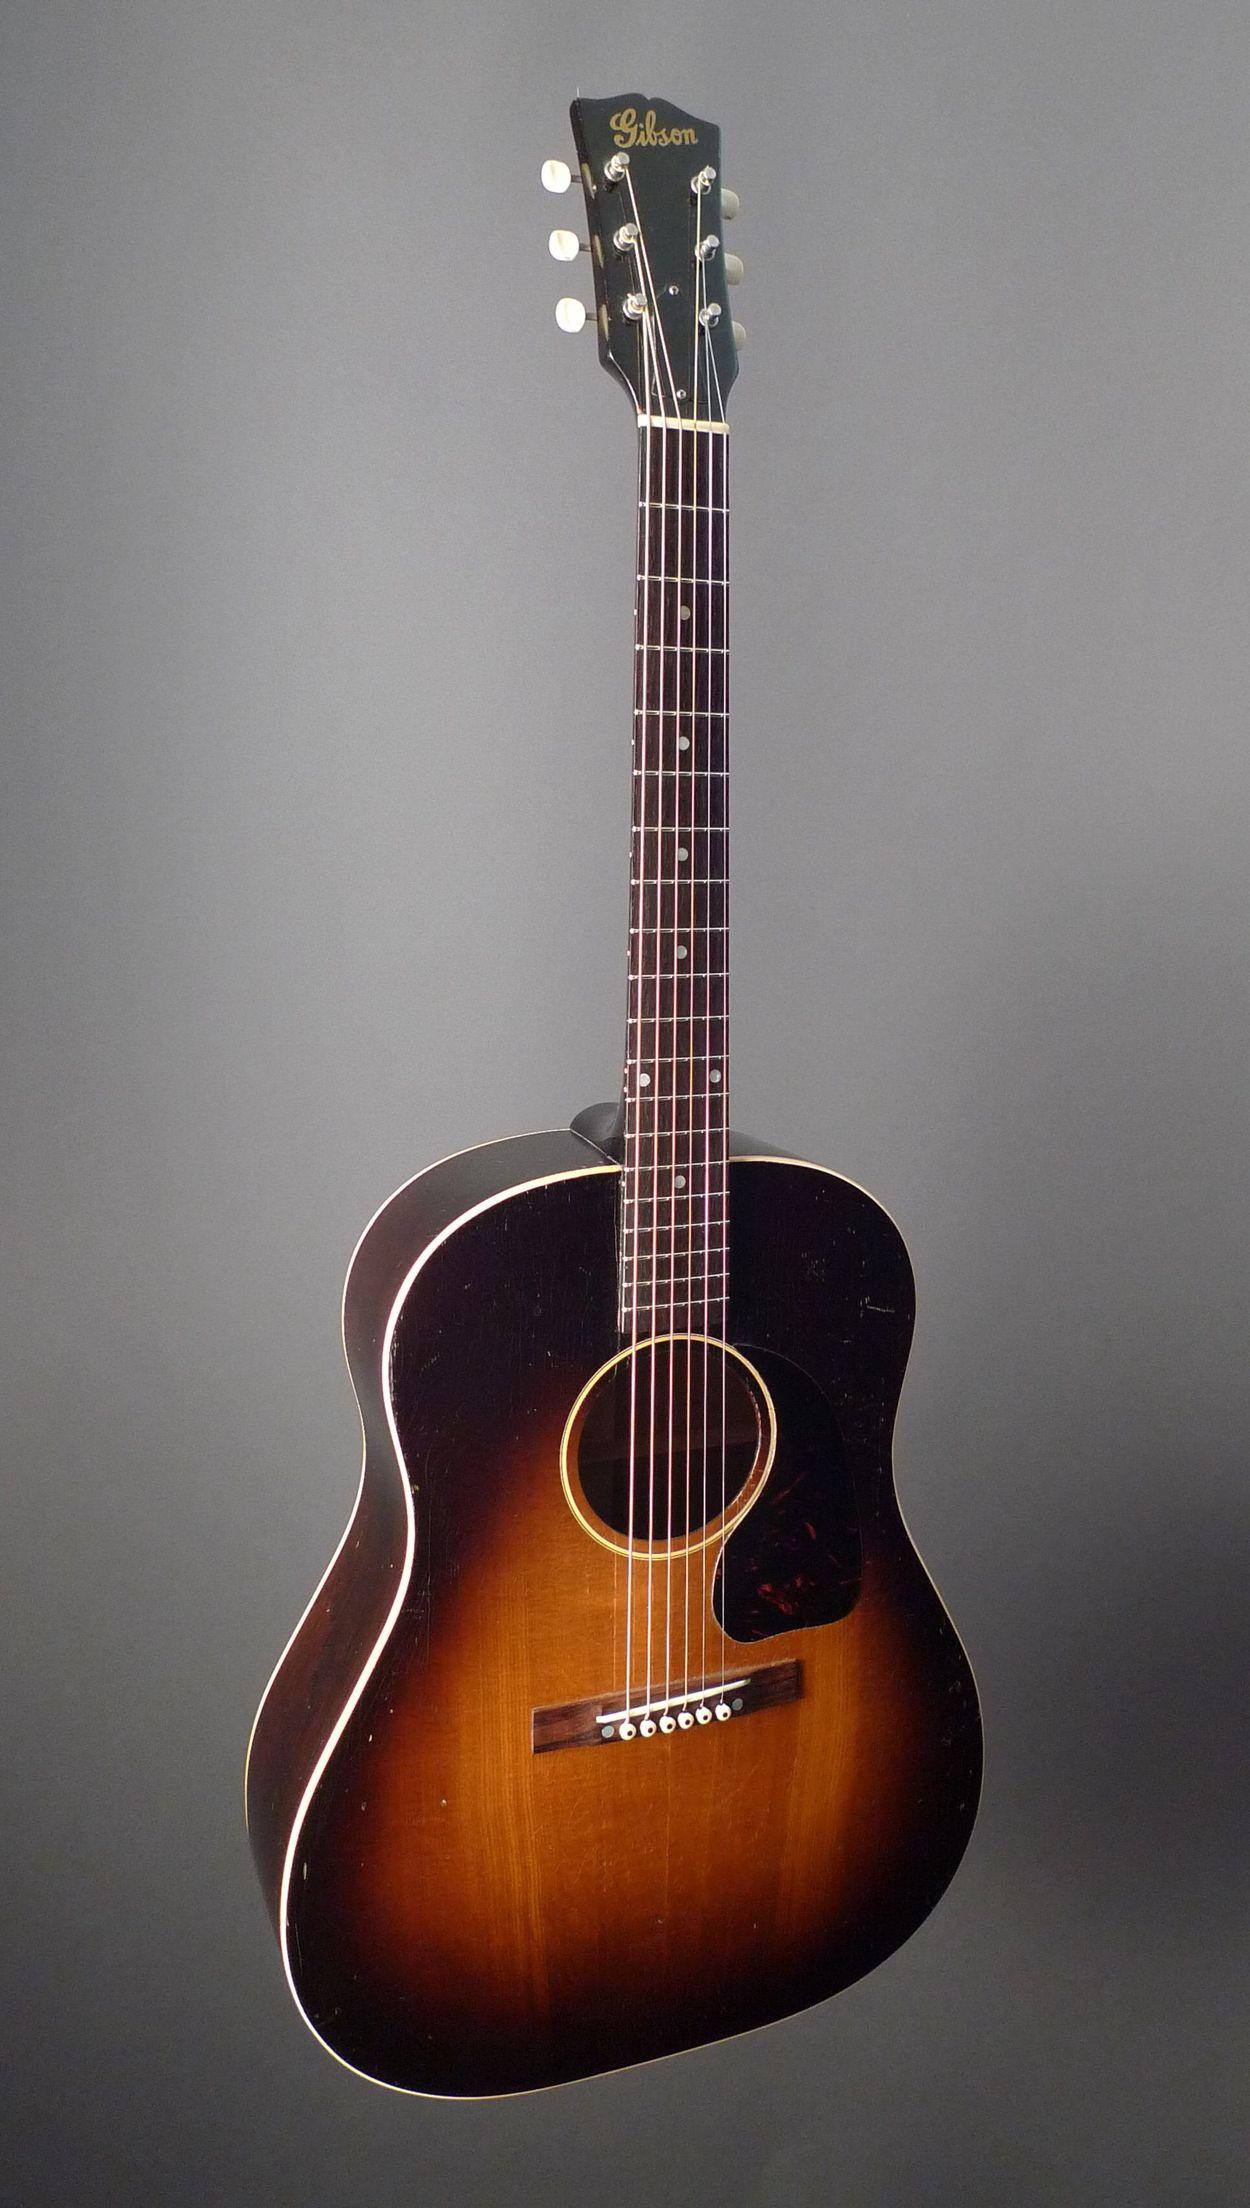 Vintage 1946 Gibson J 45 Acoustic Guitar Guitar Acoustic Guitar Photography Acoustic Guitar